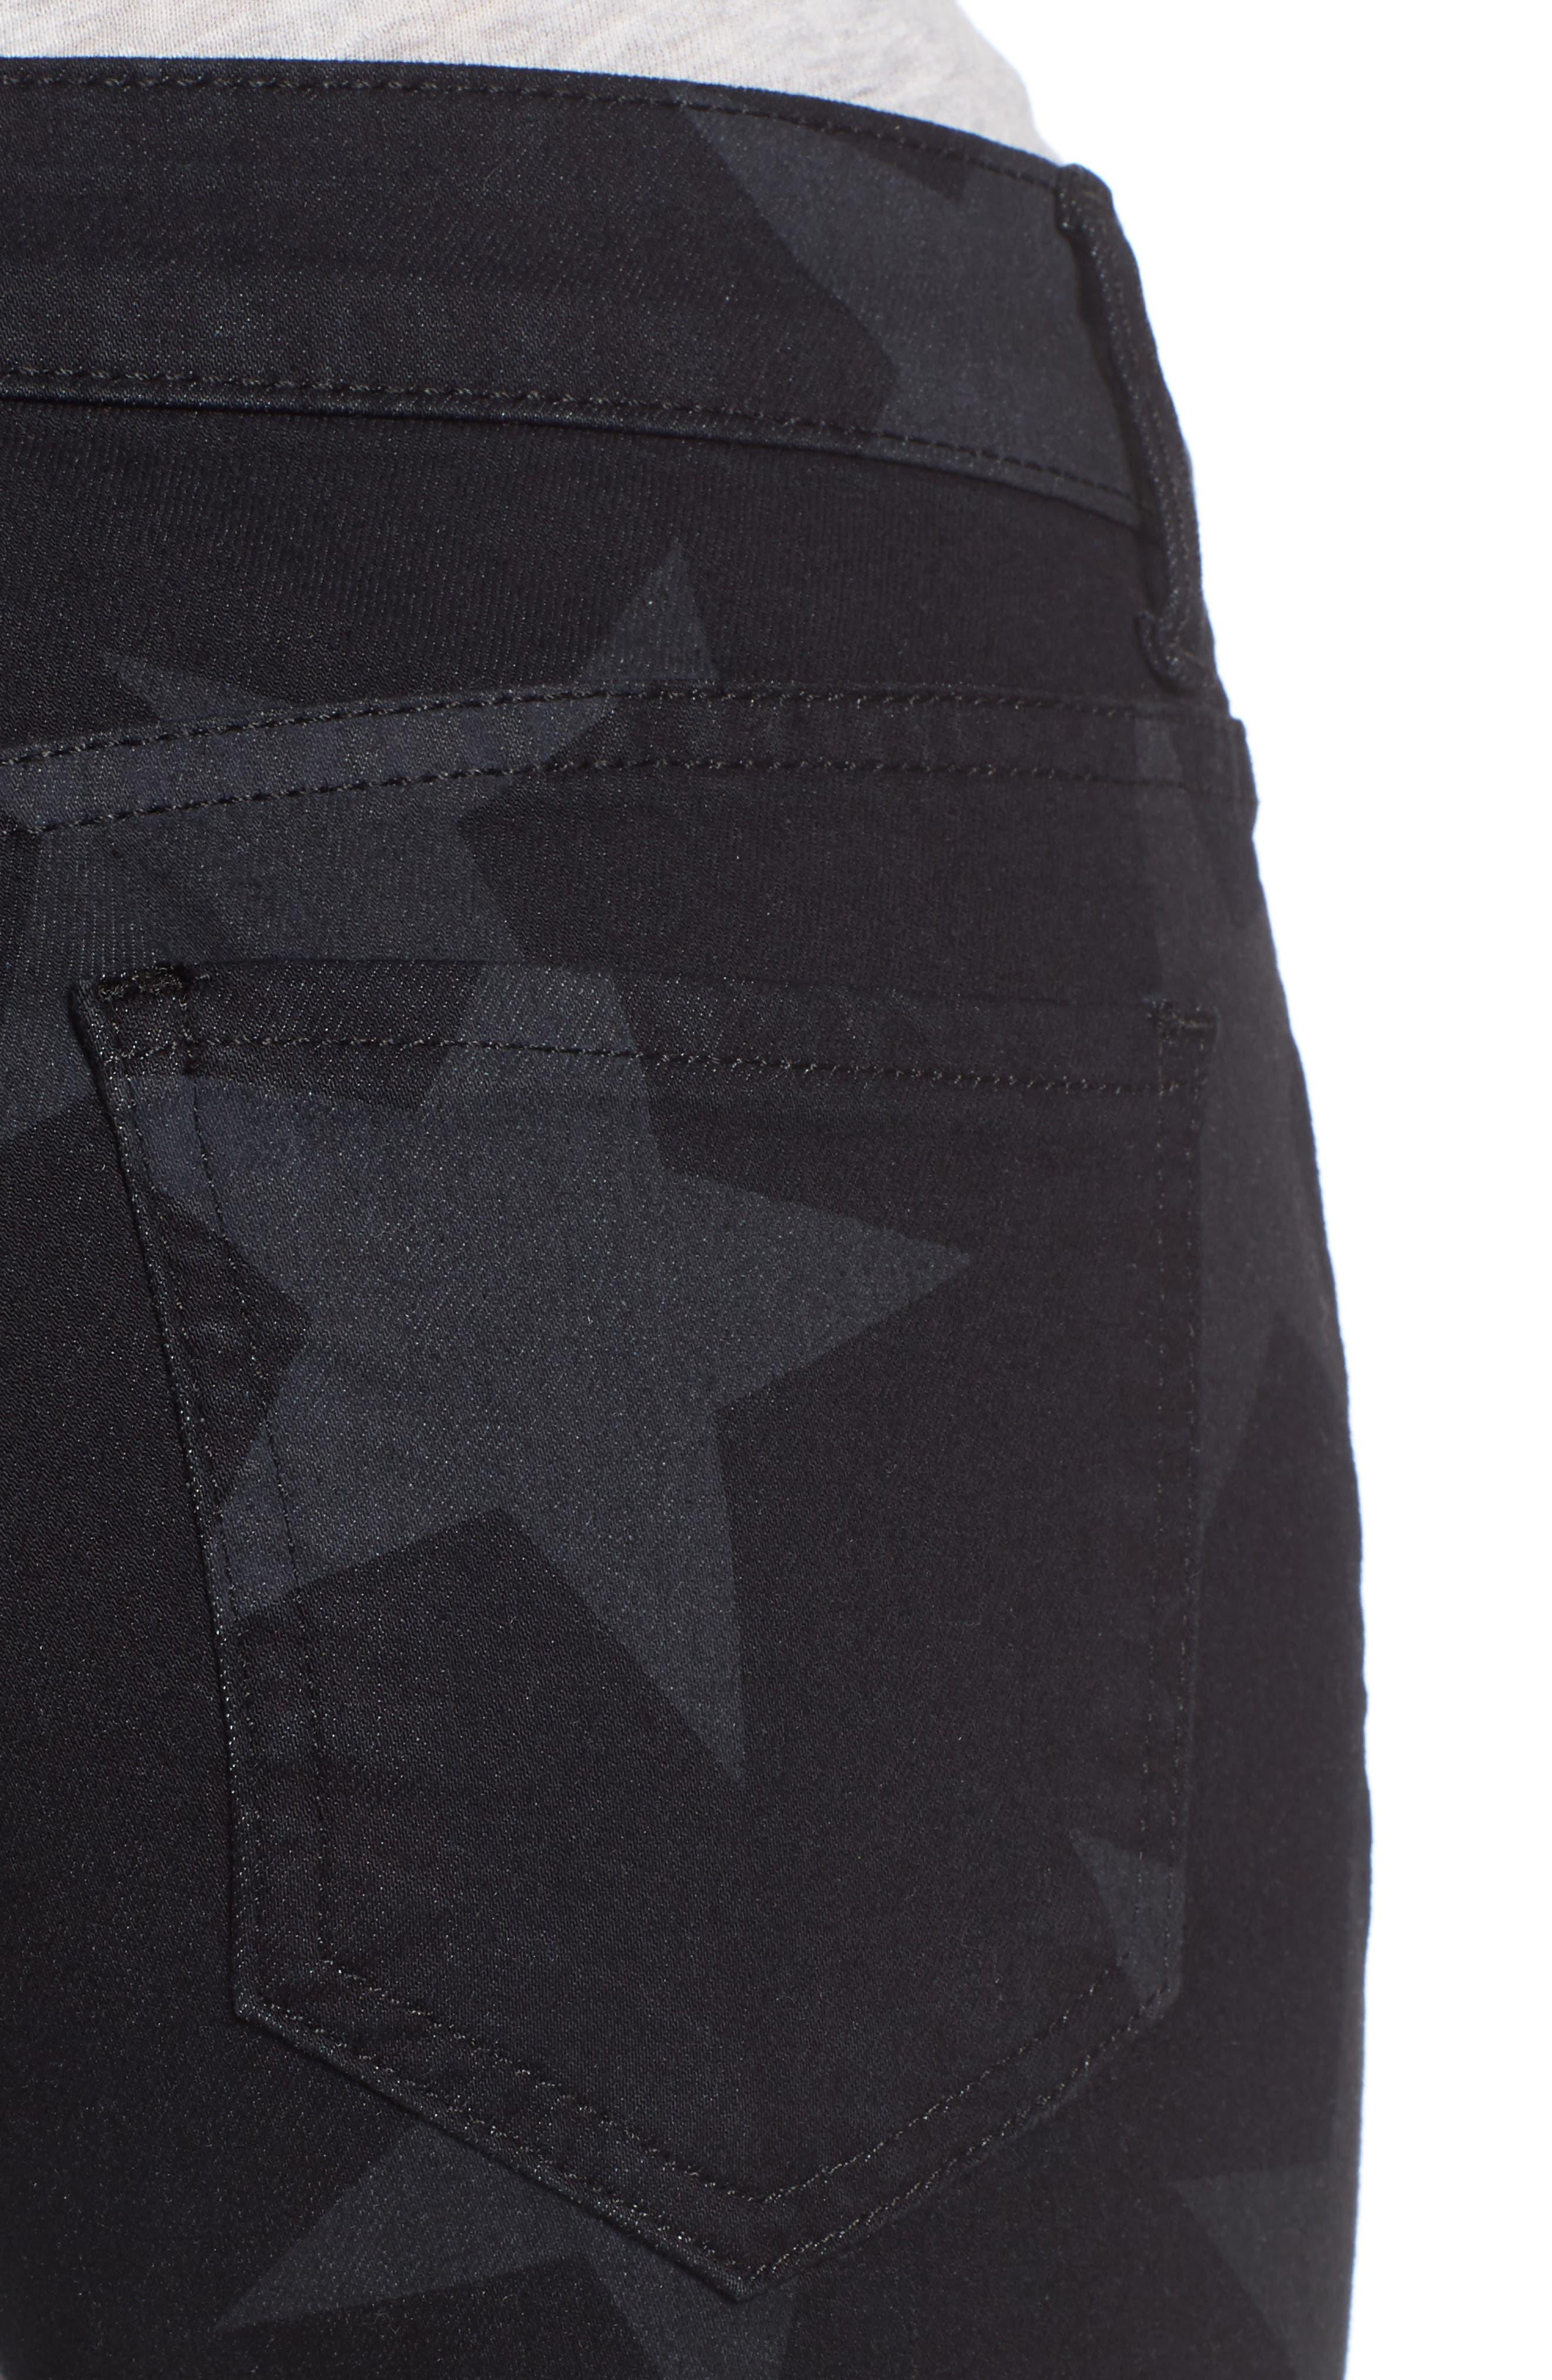 Mia Star Print Skinny Jeans,                             Alternate thumbnail 4, color,                             Trailblazing